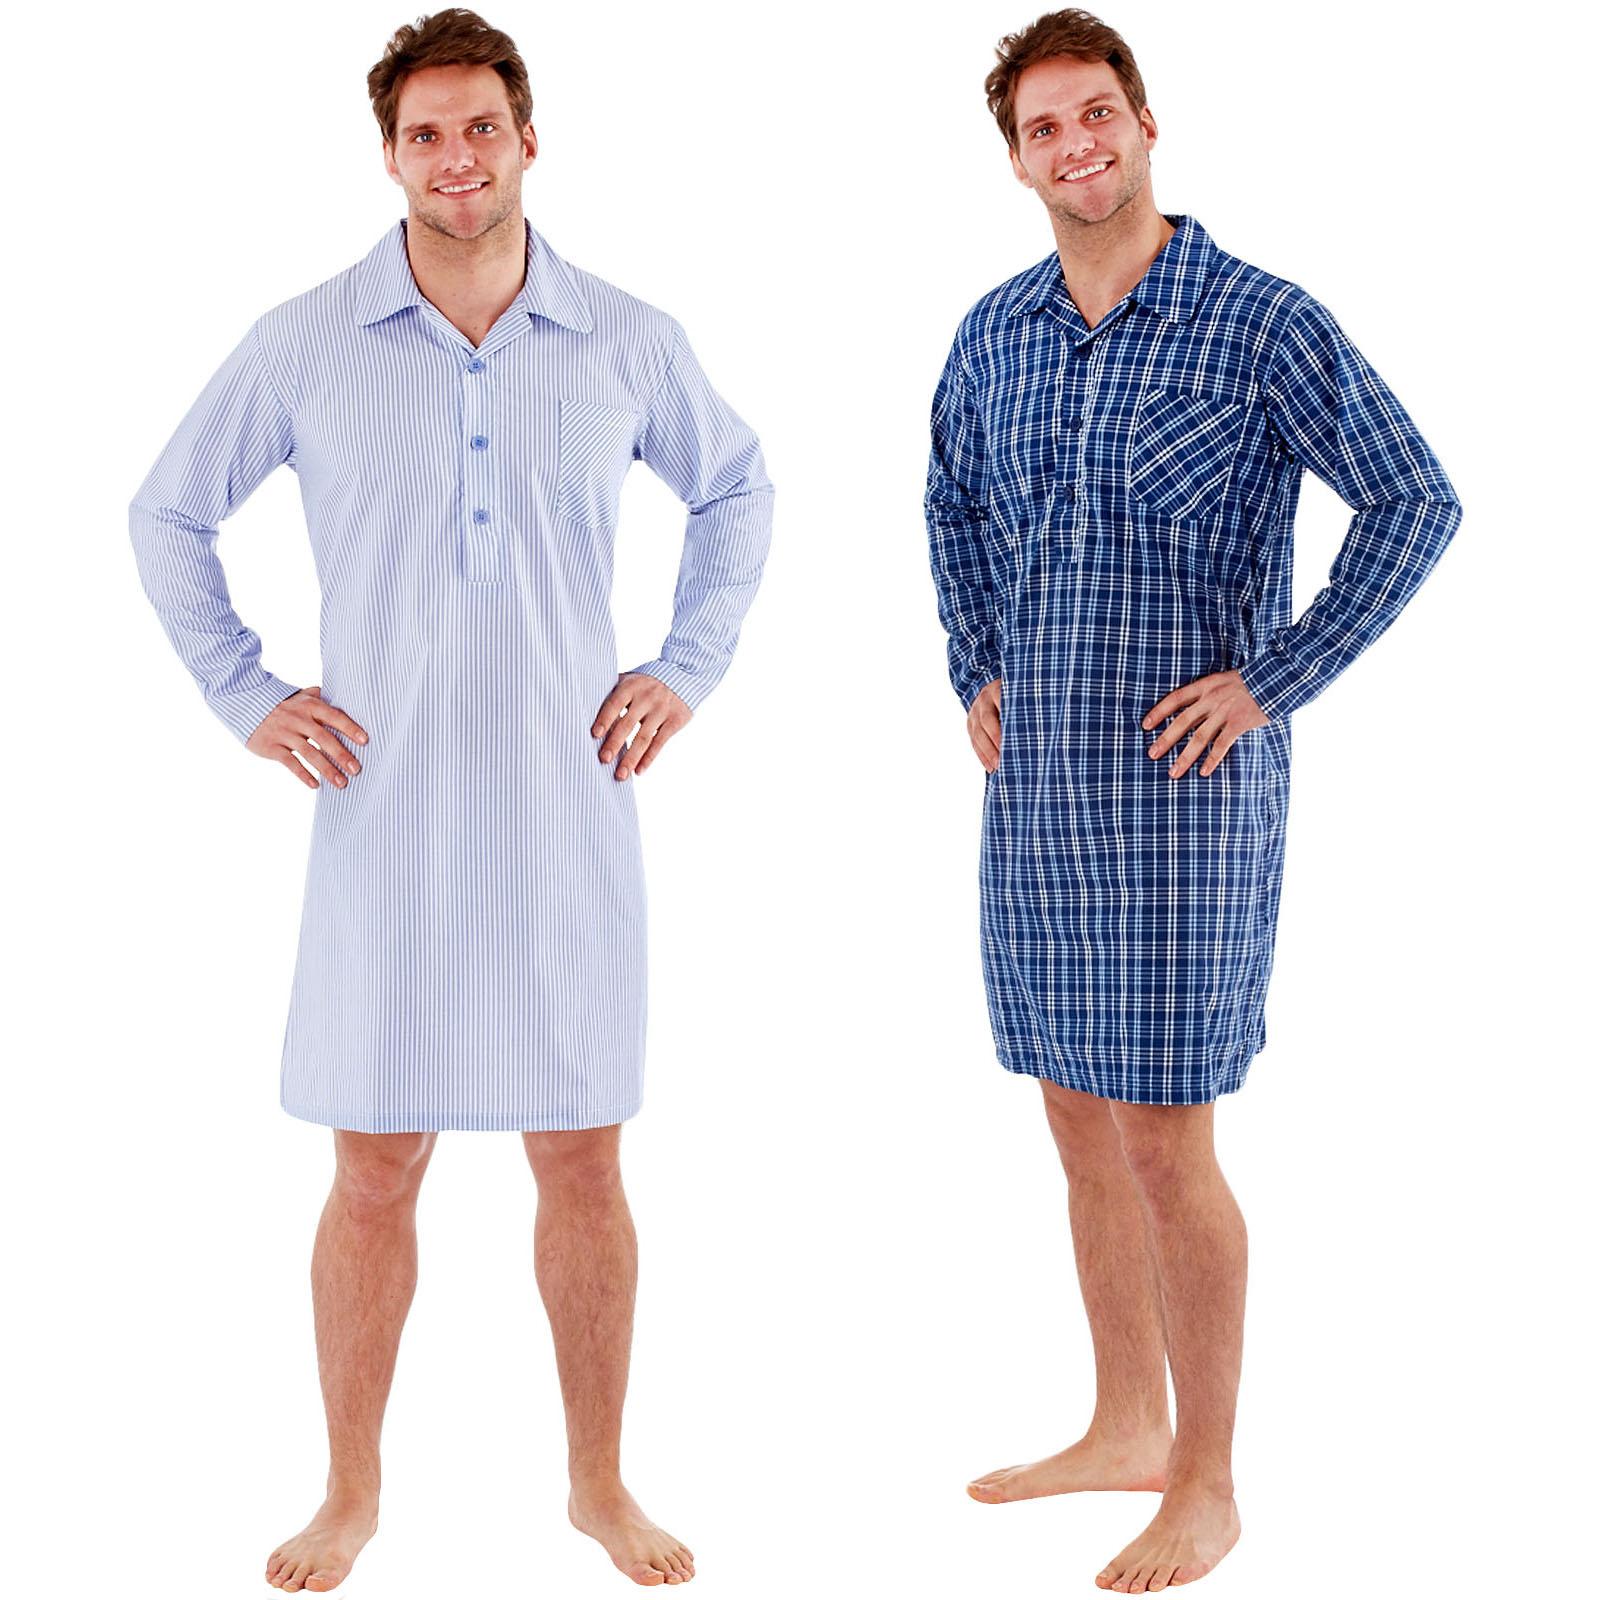 e075c7fafa Mens Summer Weight Nightshirts - Joe Maloy